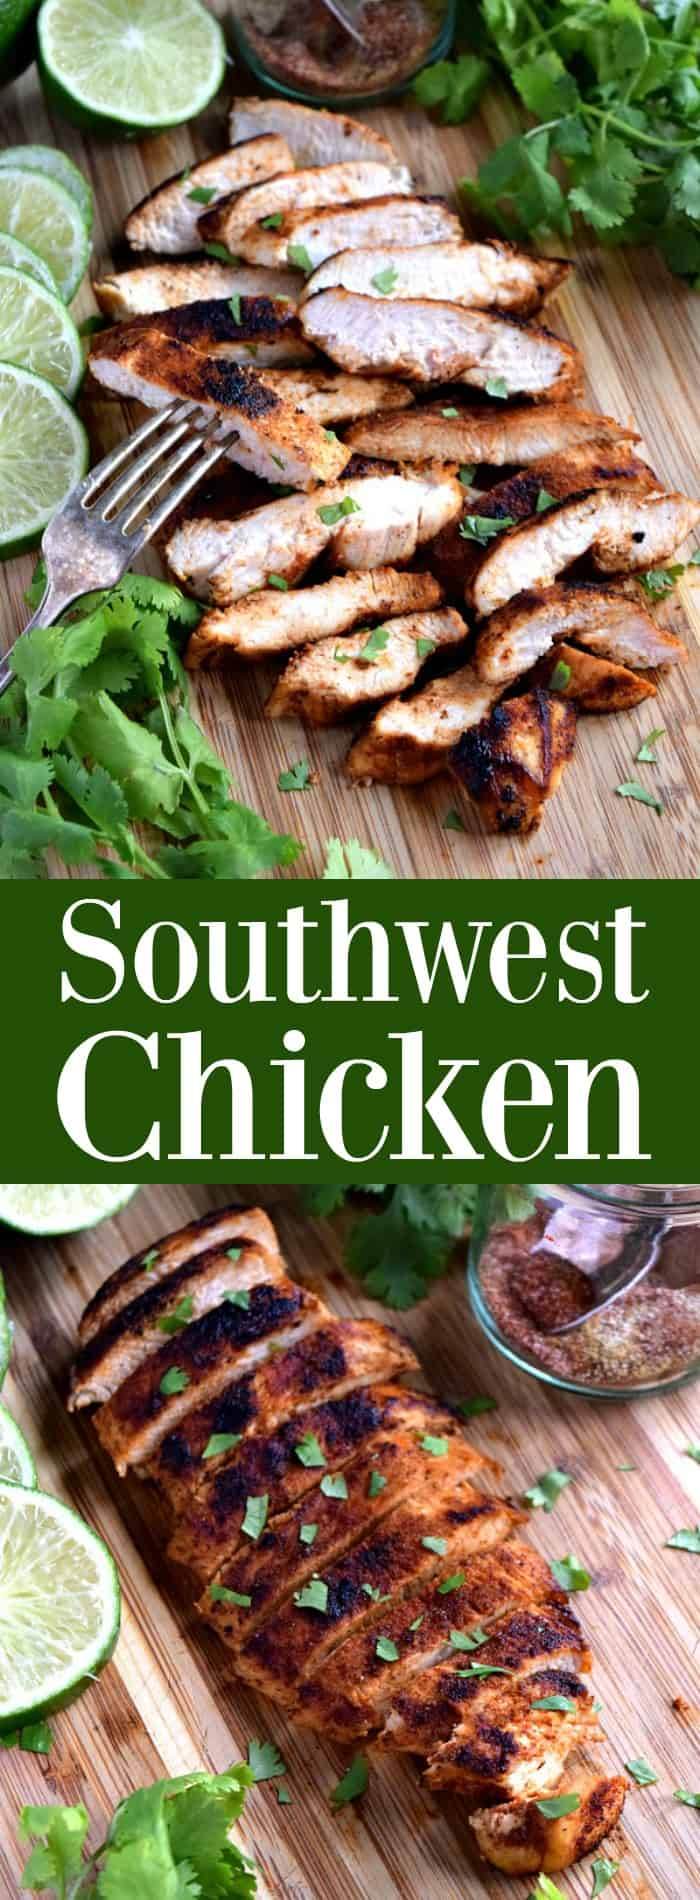 Easy Southwest Chicken Recipe